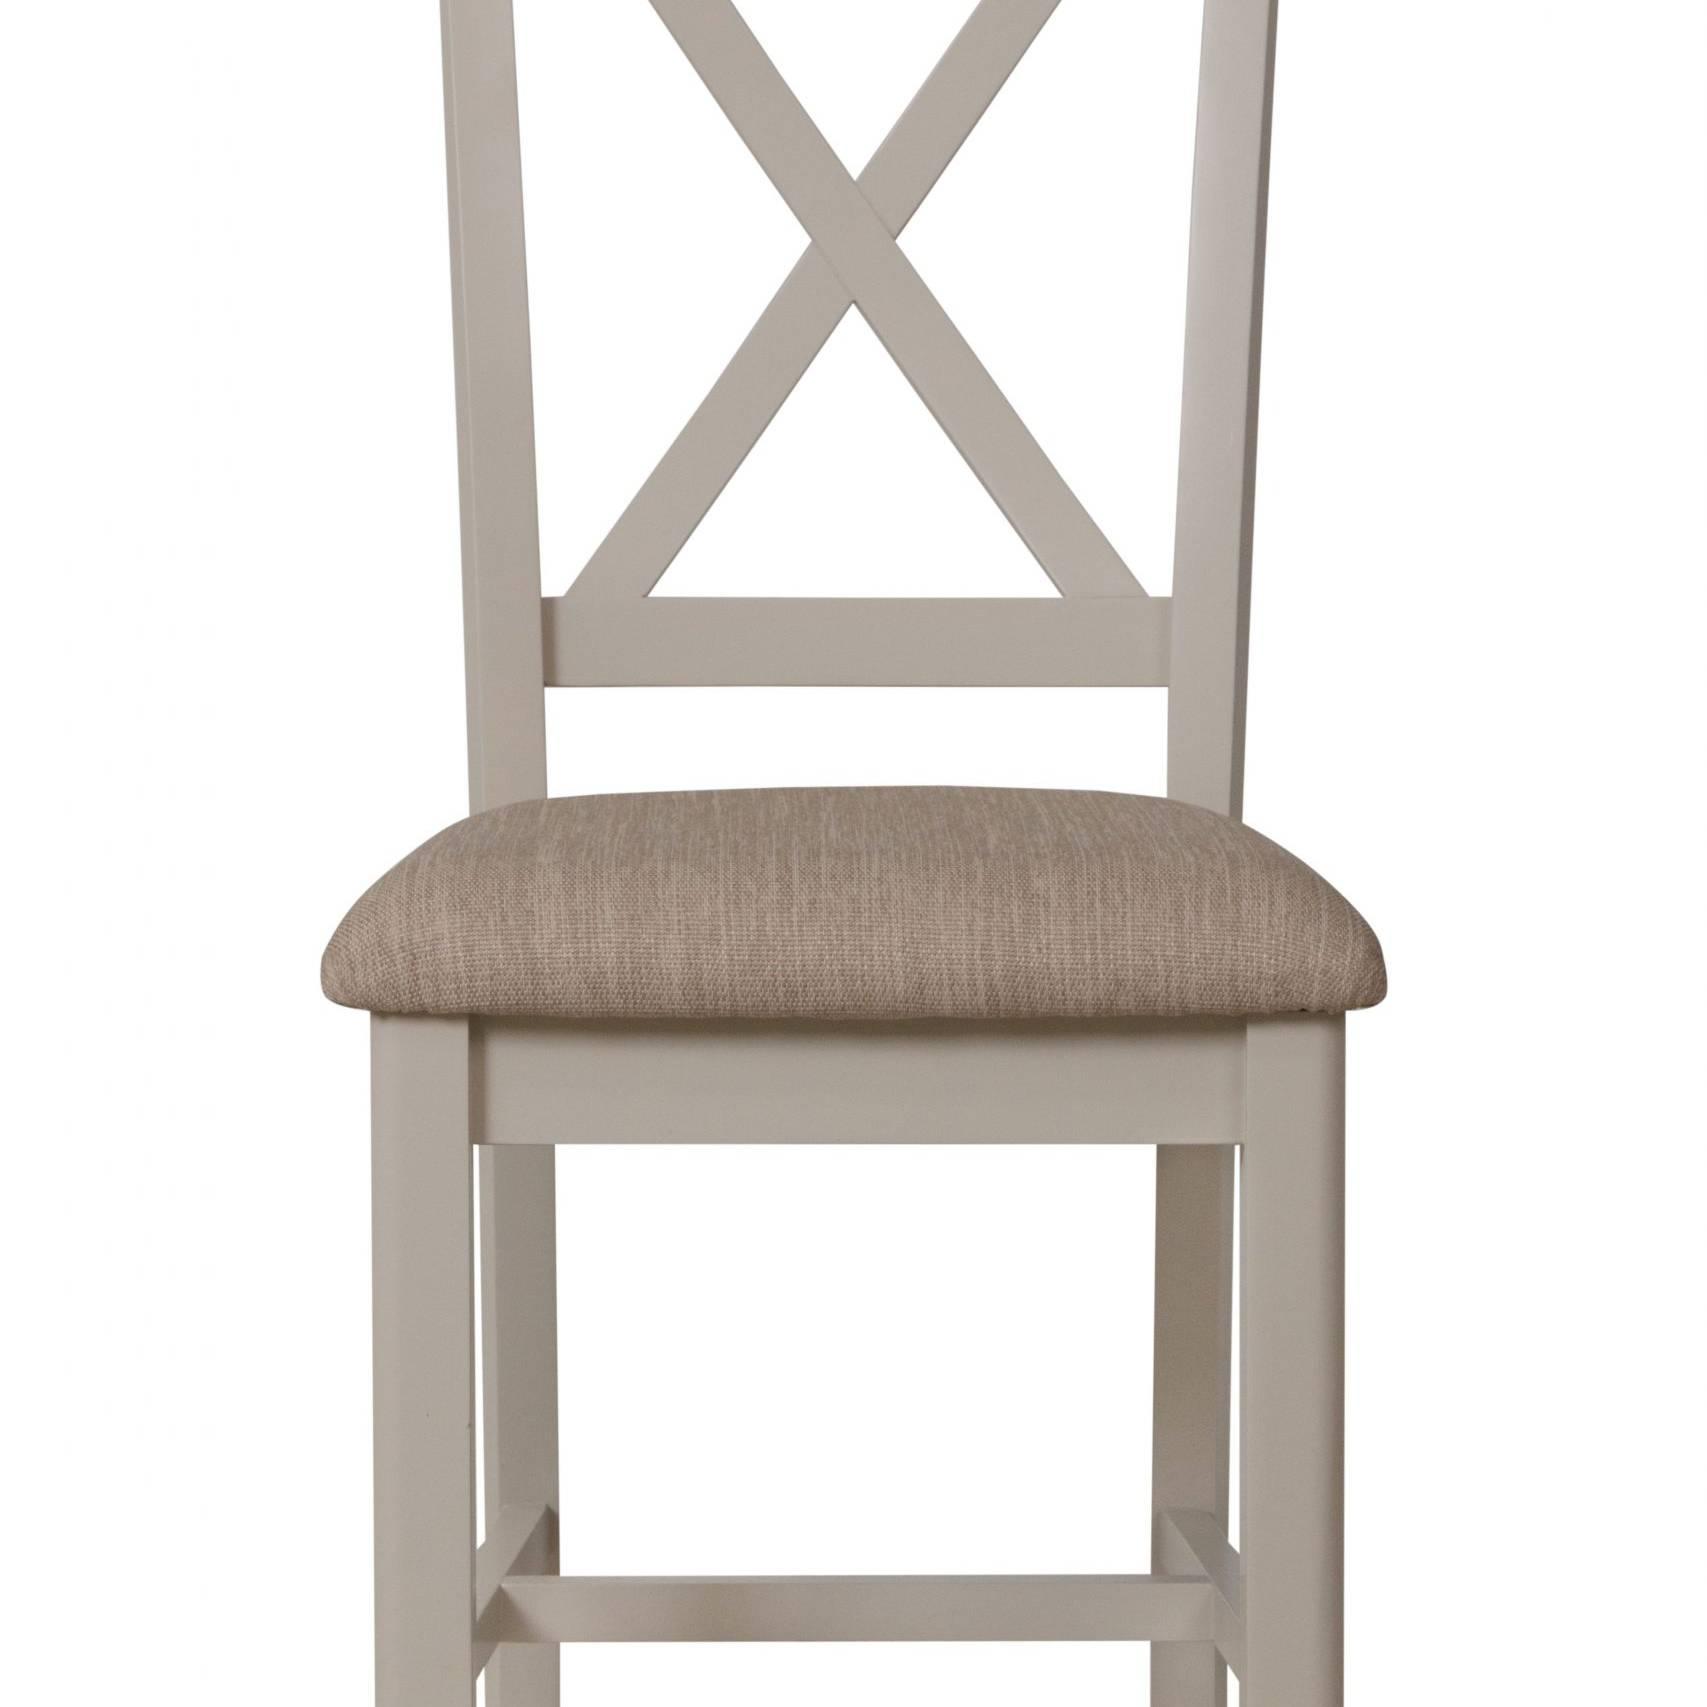 The Truffle - Chair